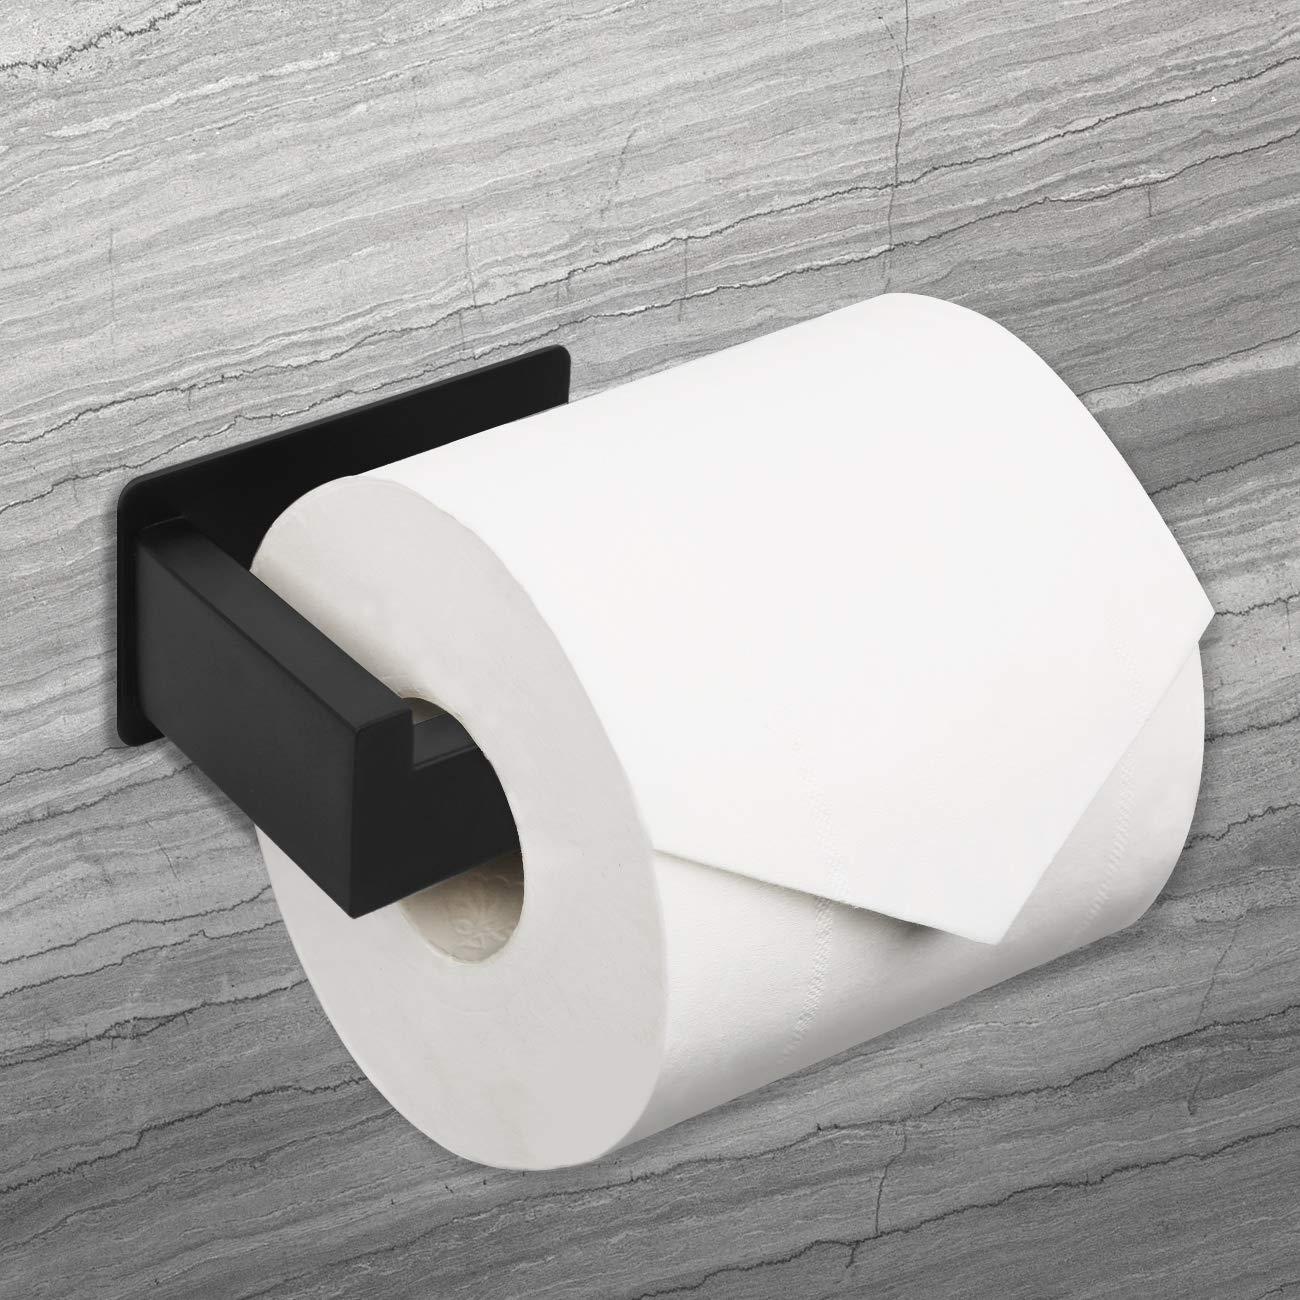 HAUSPROFI Soporte de papel higi/énico de acero inoxidable con autoadhesivo Negro Mate sin agujeros